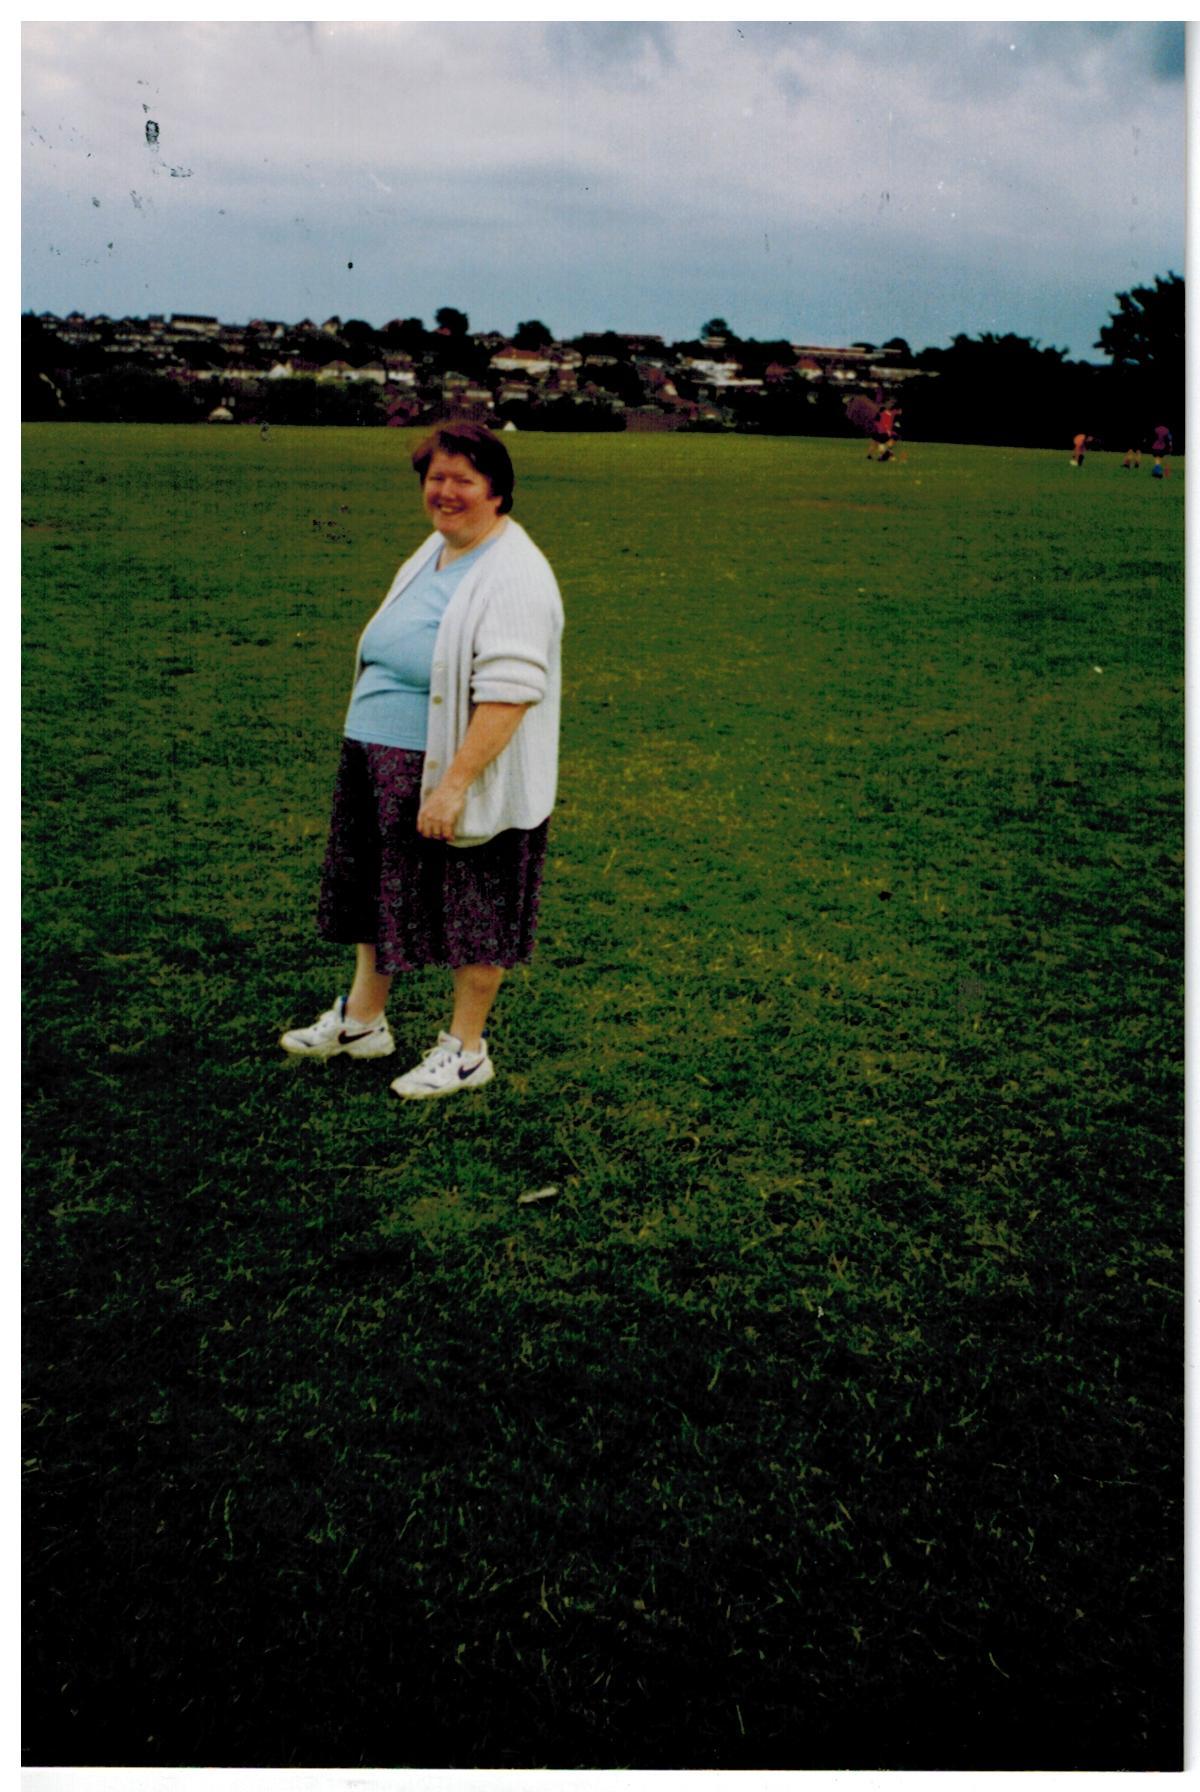 N118_Rounders_Homer-Hill_[15-07-1998]